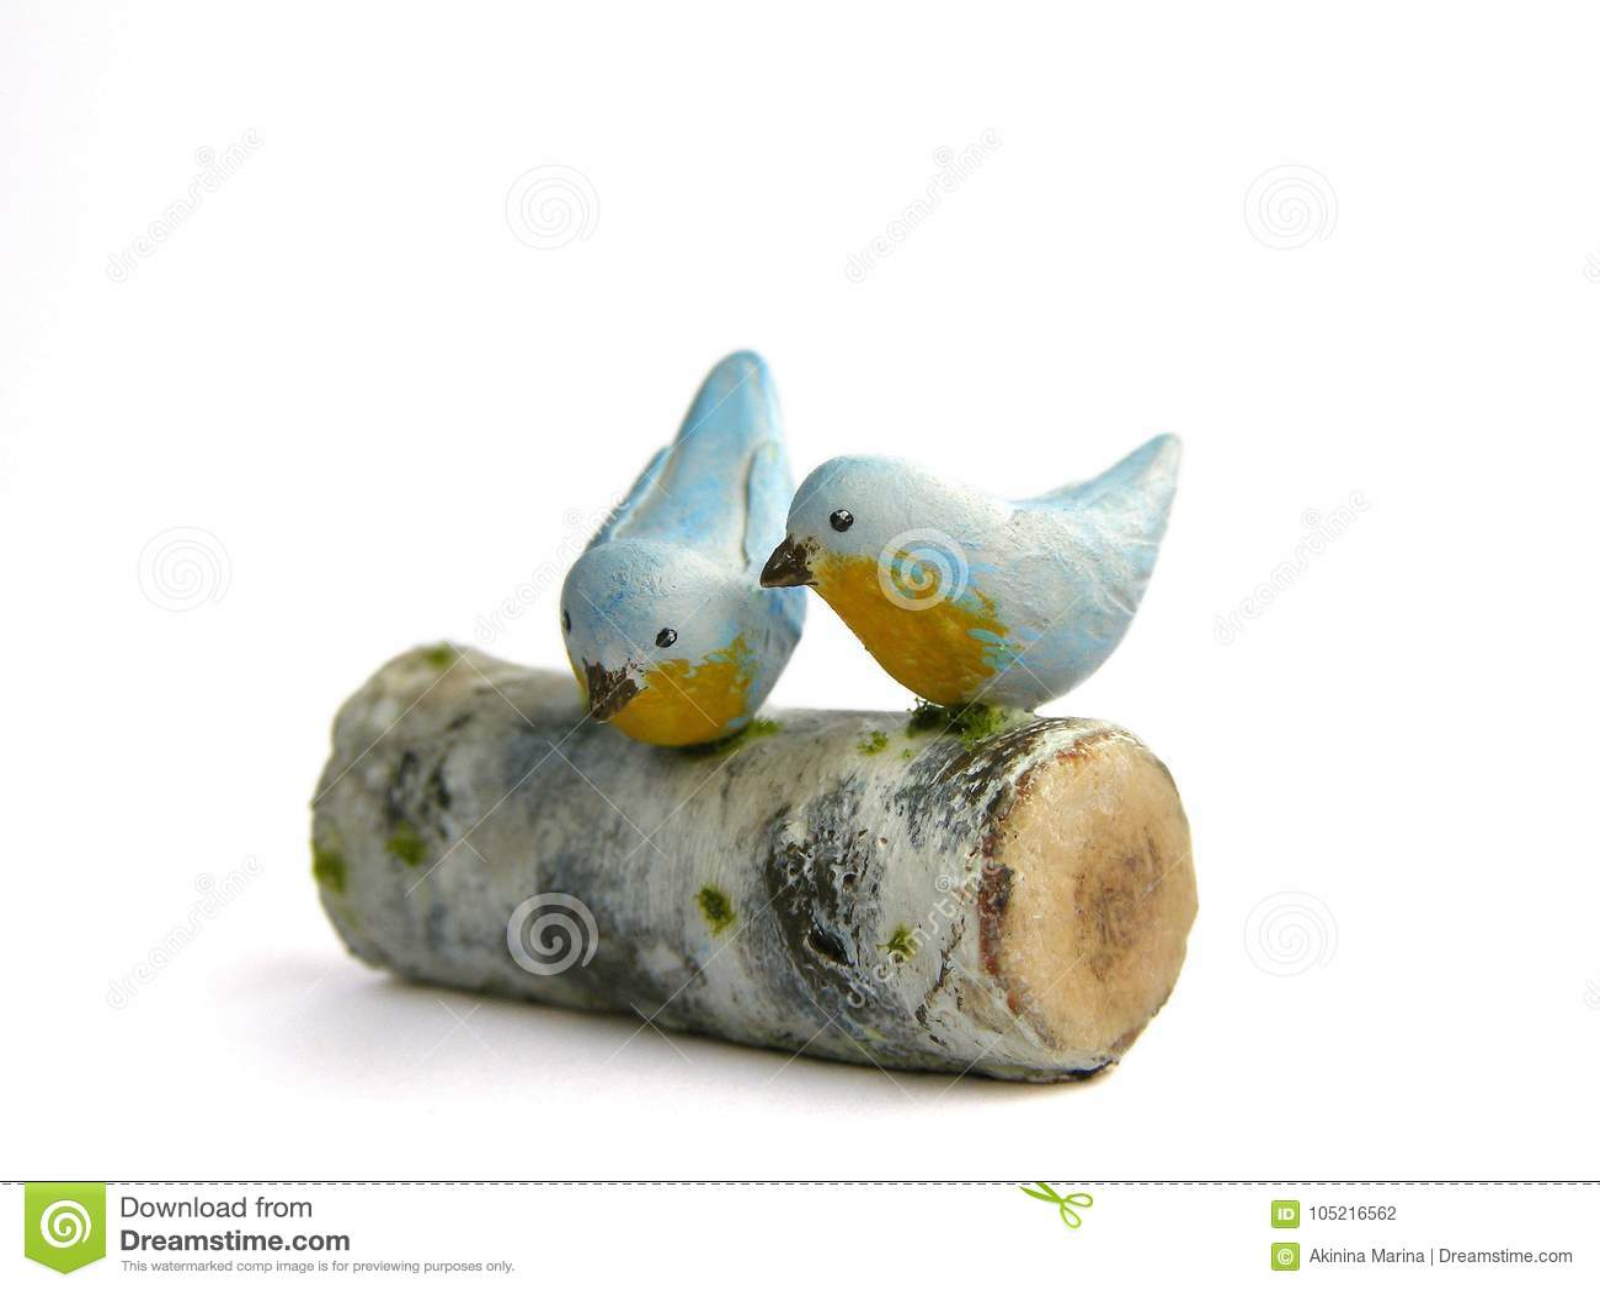 Fotominiaturfälschung zwei Vögel auf Birkenklotz